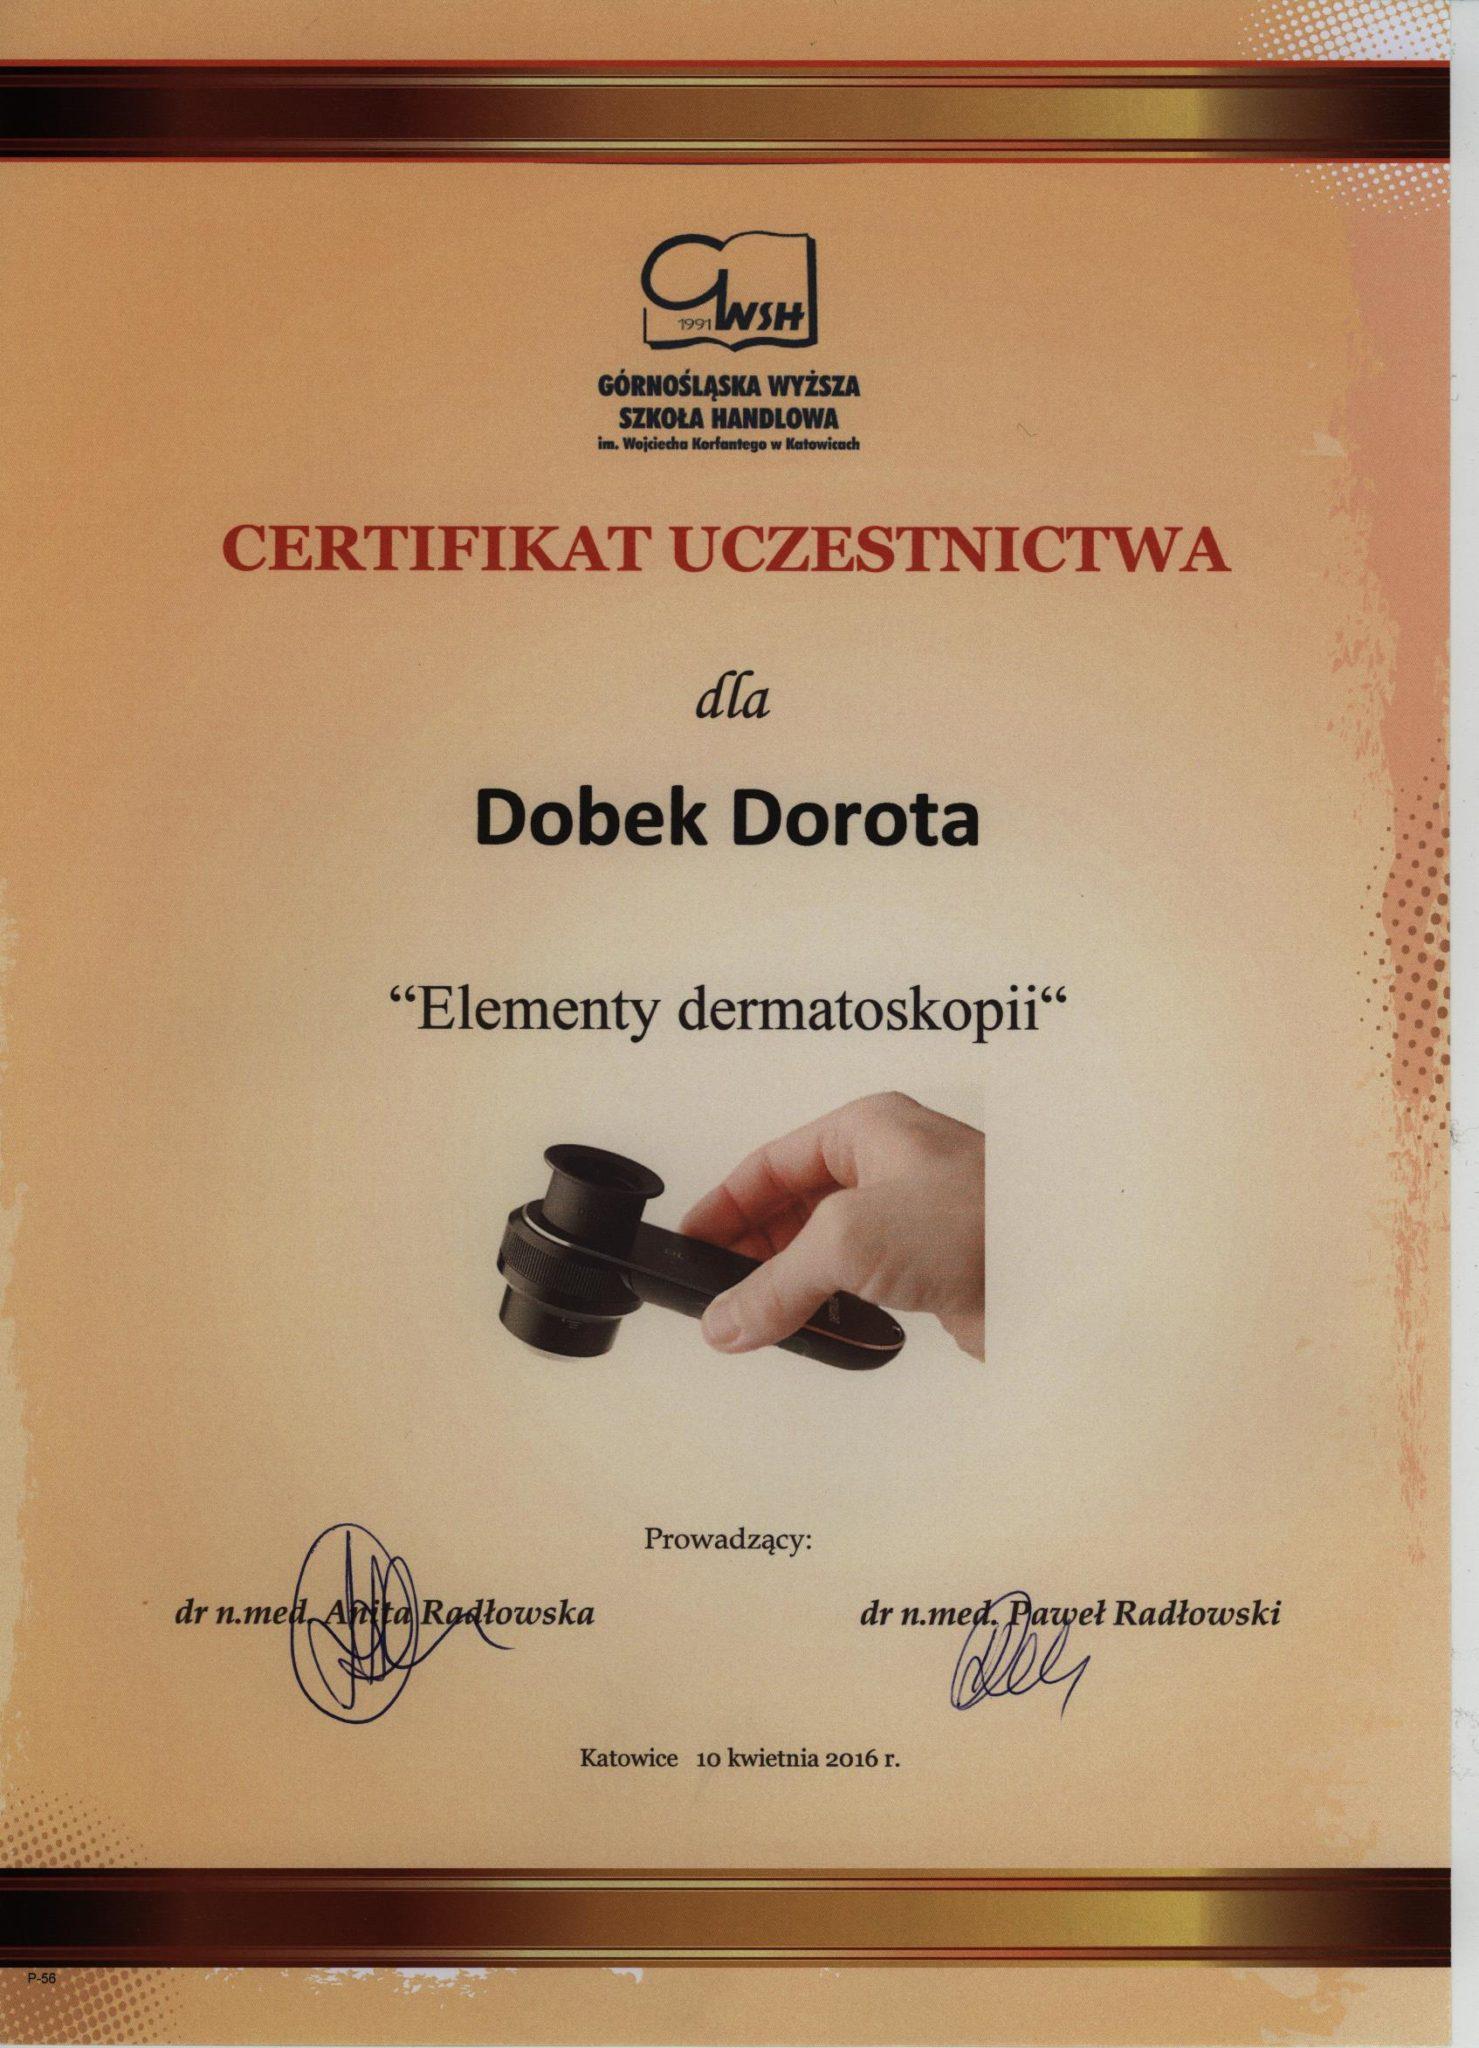 medycyna estetyczna certyfikat